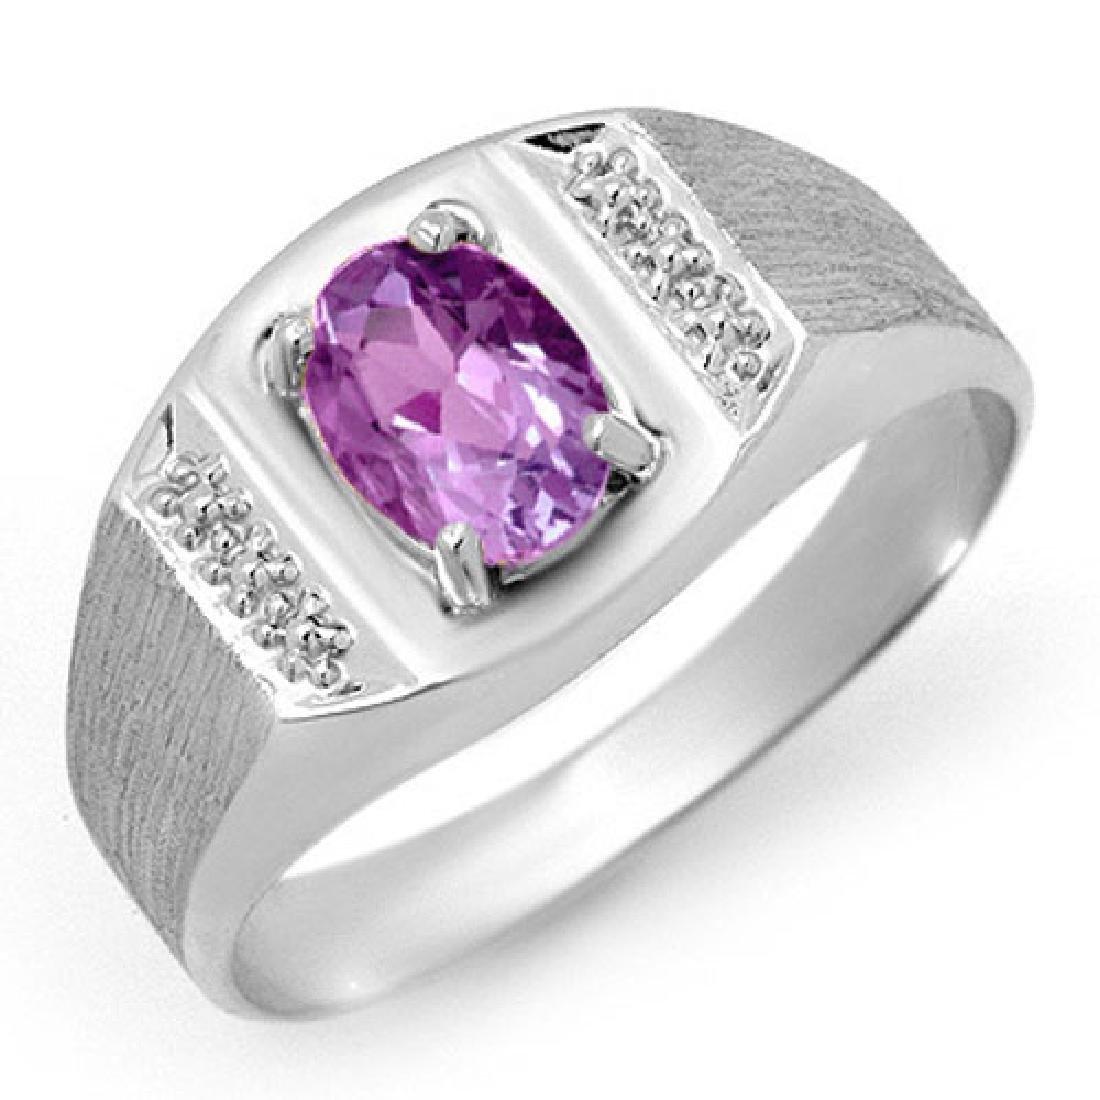 2.0 CTW Amethyst Ring 18K White Gold